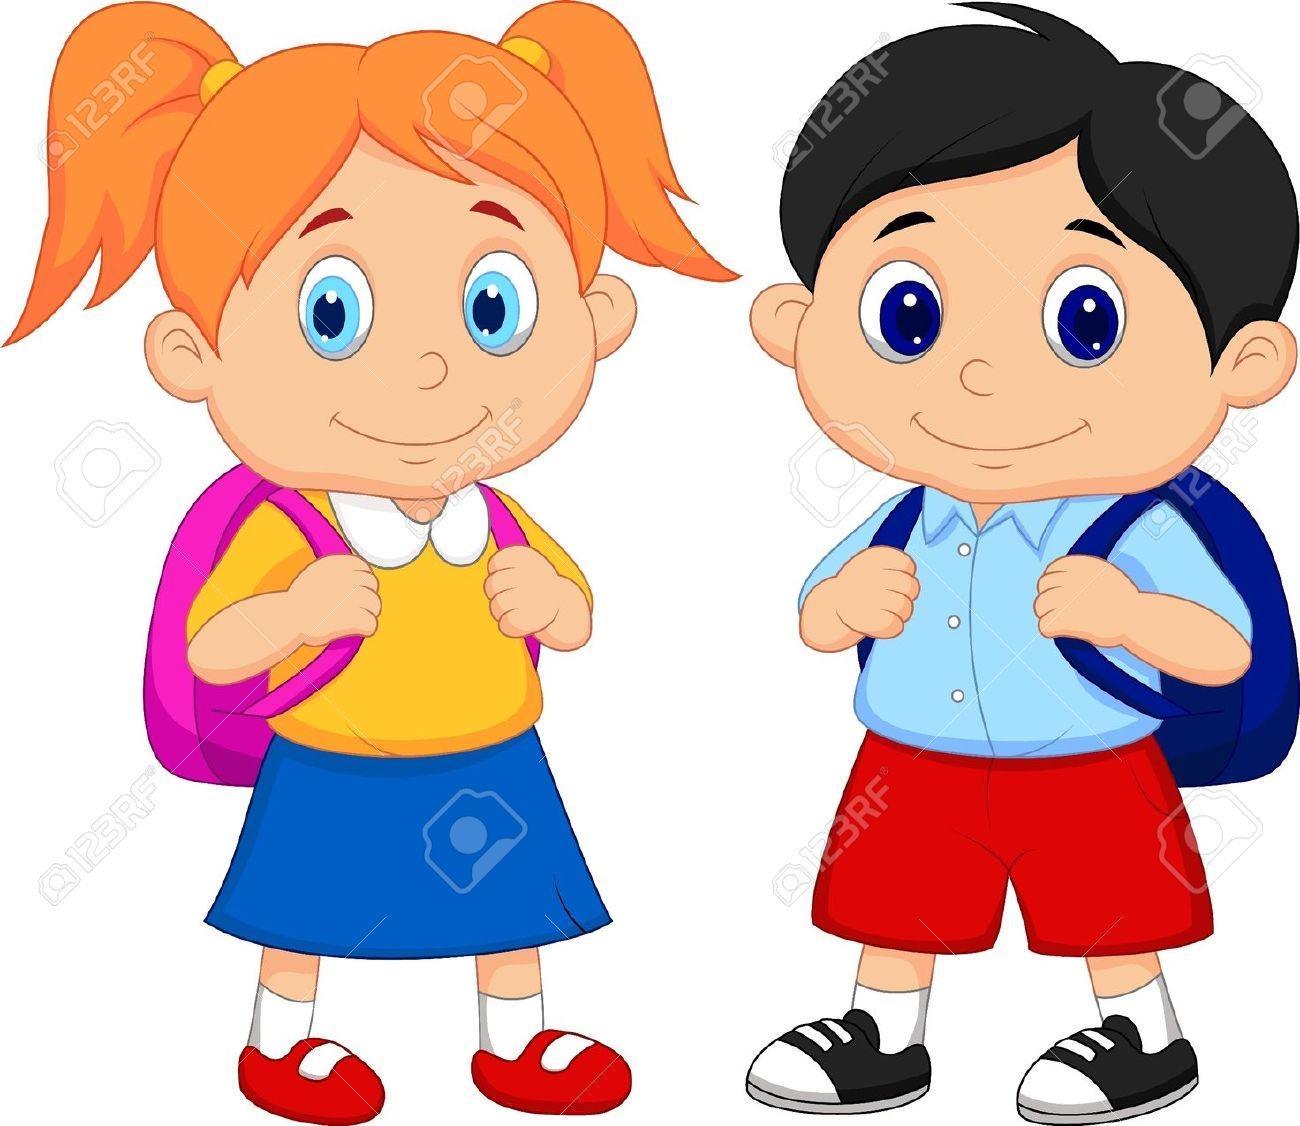 School Student With School Bag Clipart.